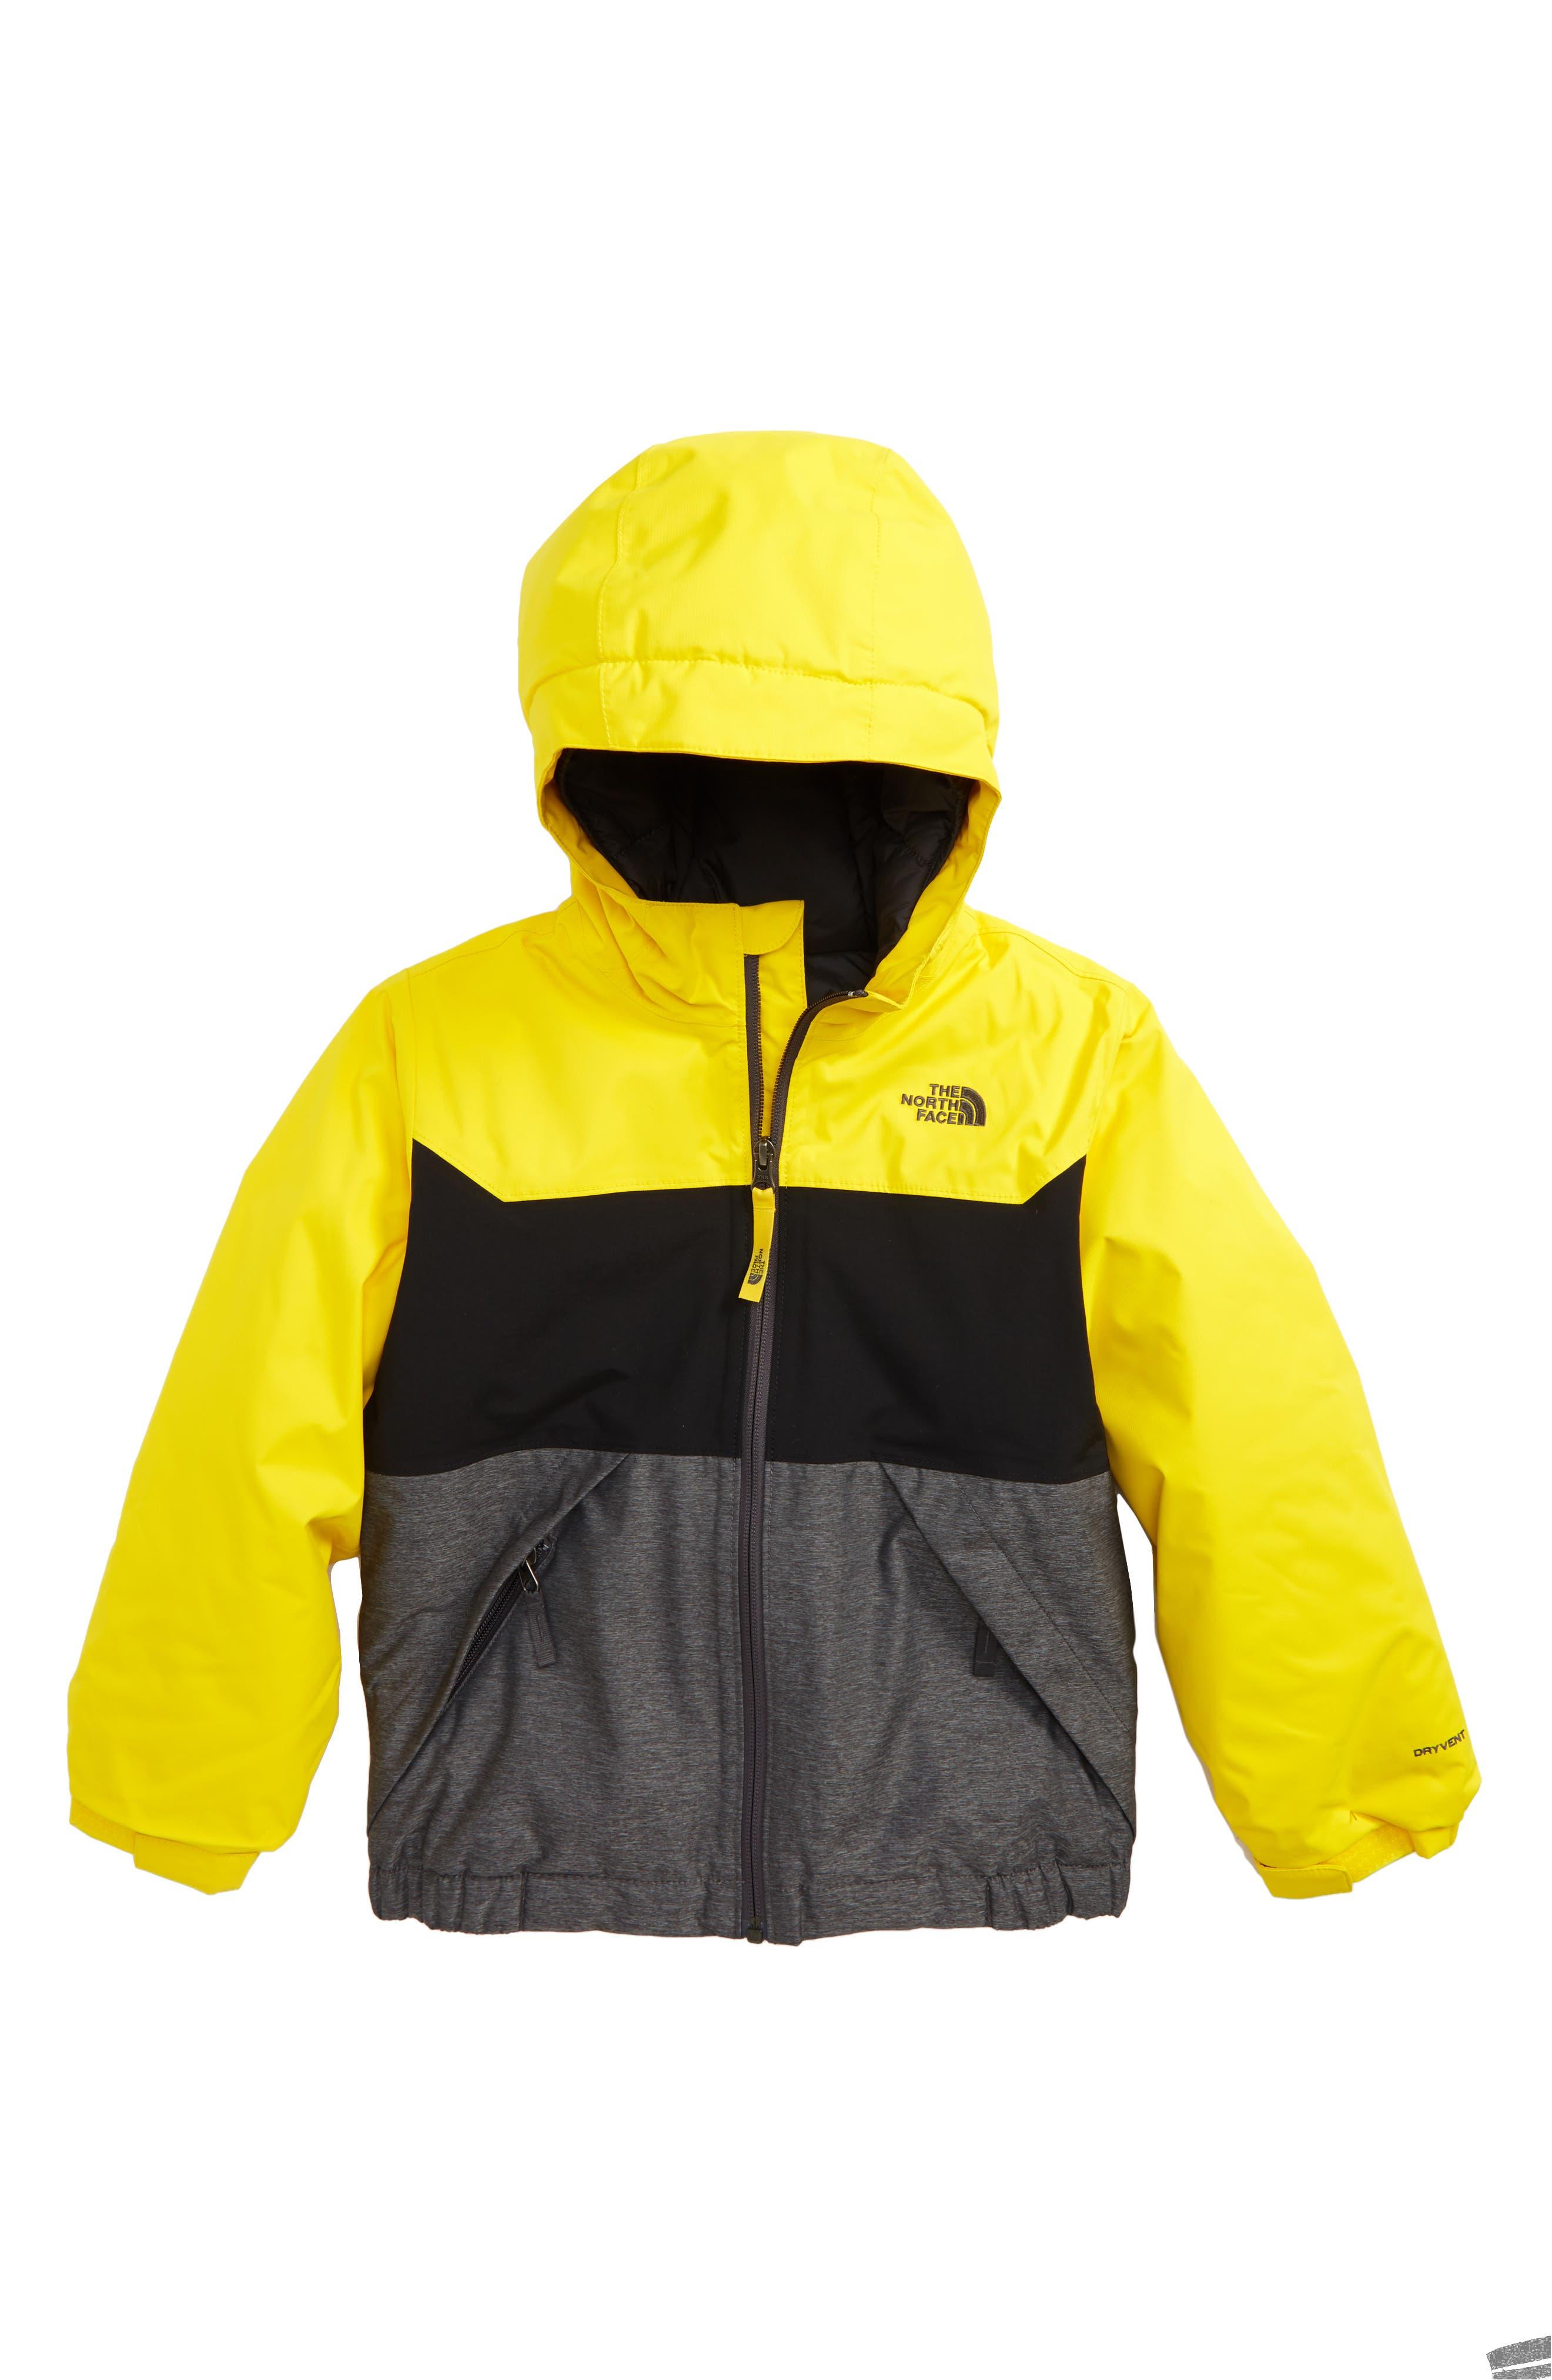 Main Image - The North Face Brayden Heatseeker™ Insulated Waterproof & Windproof Jacket (Toddler Boys & Little Boys)